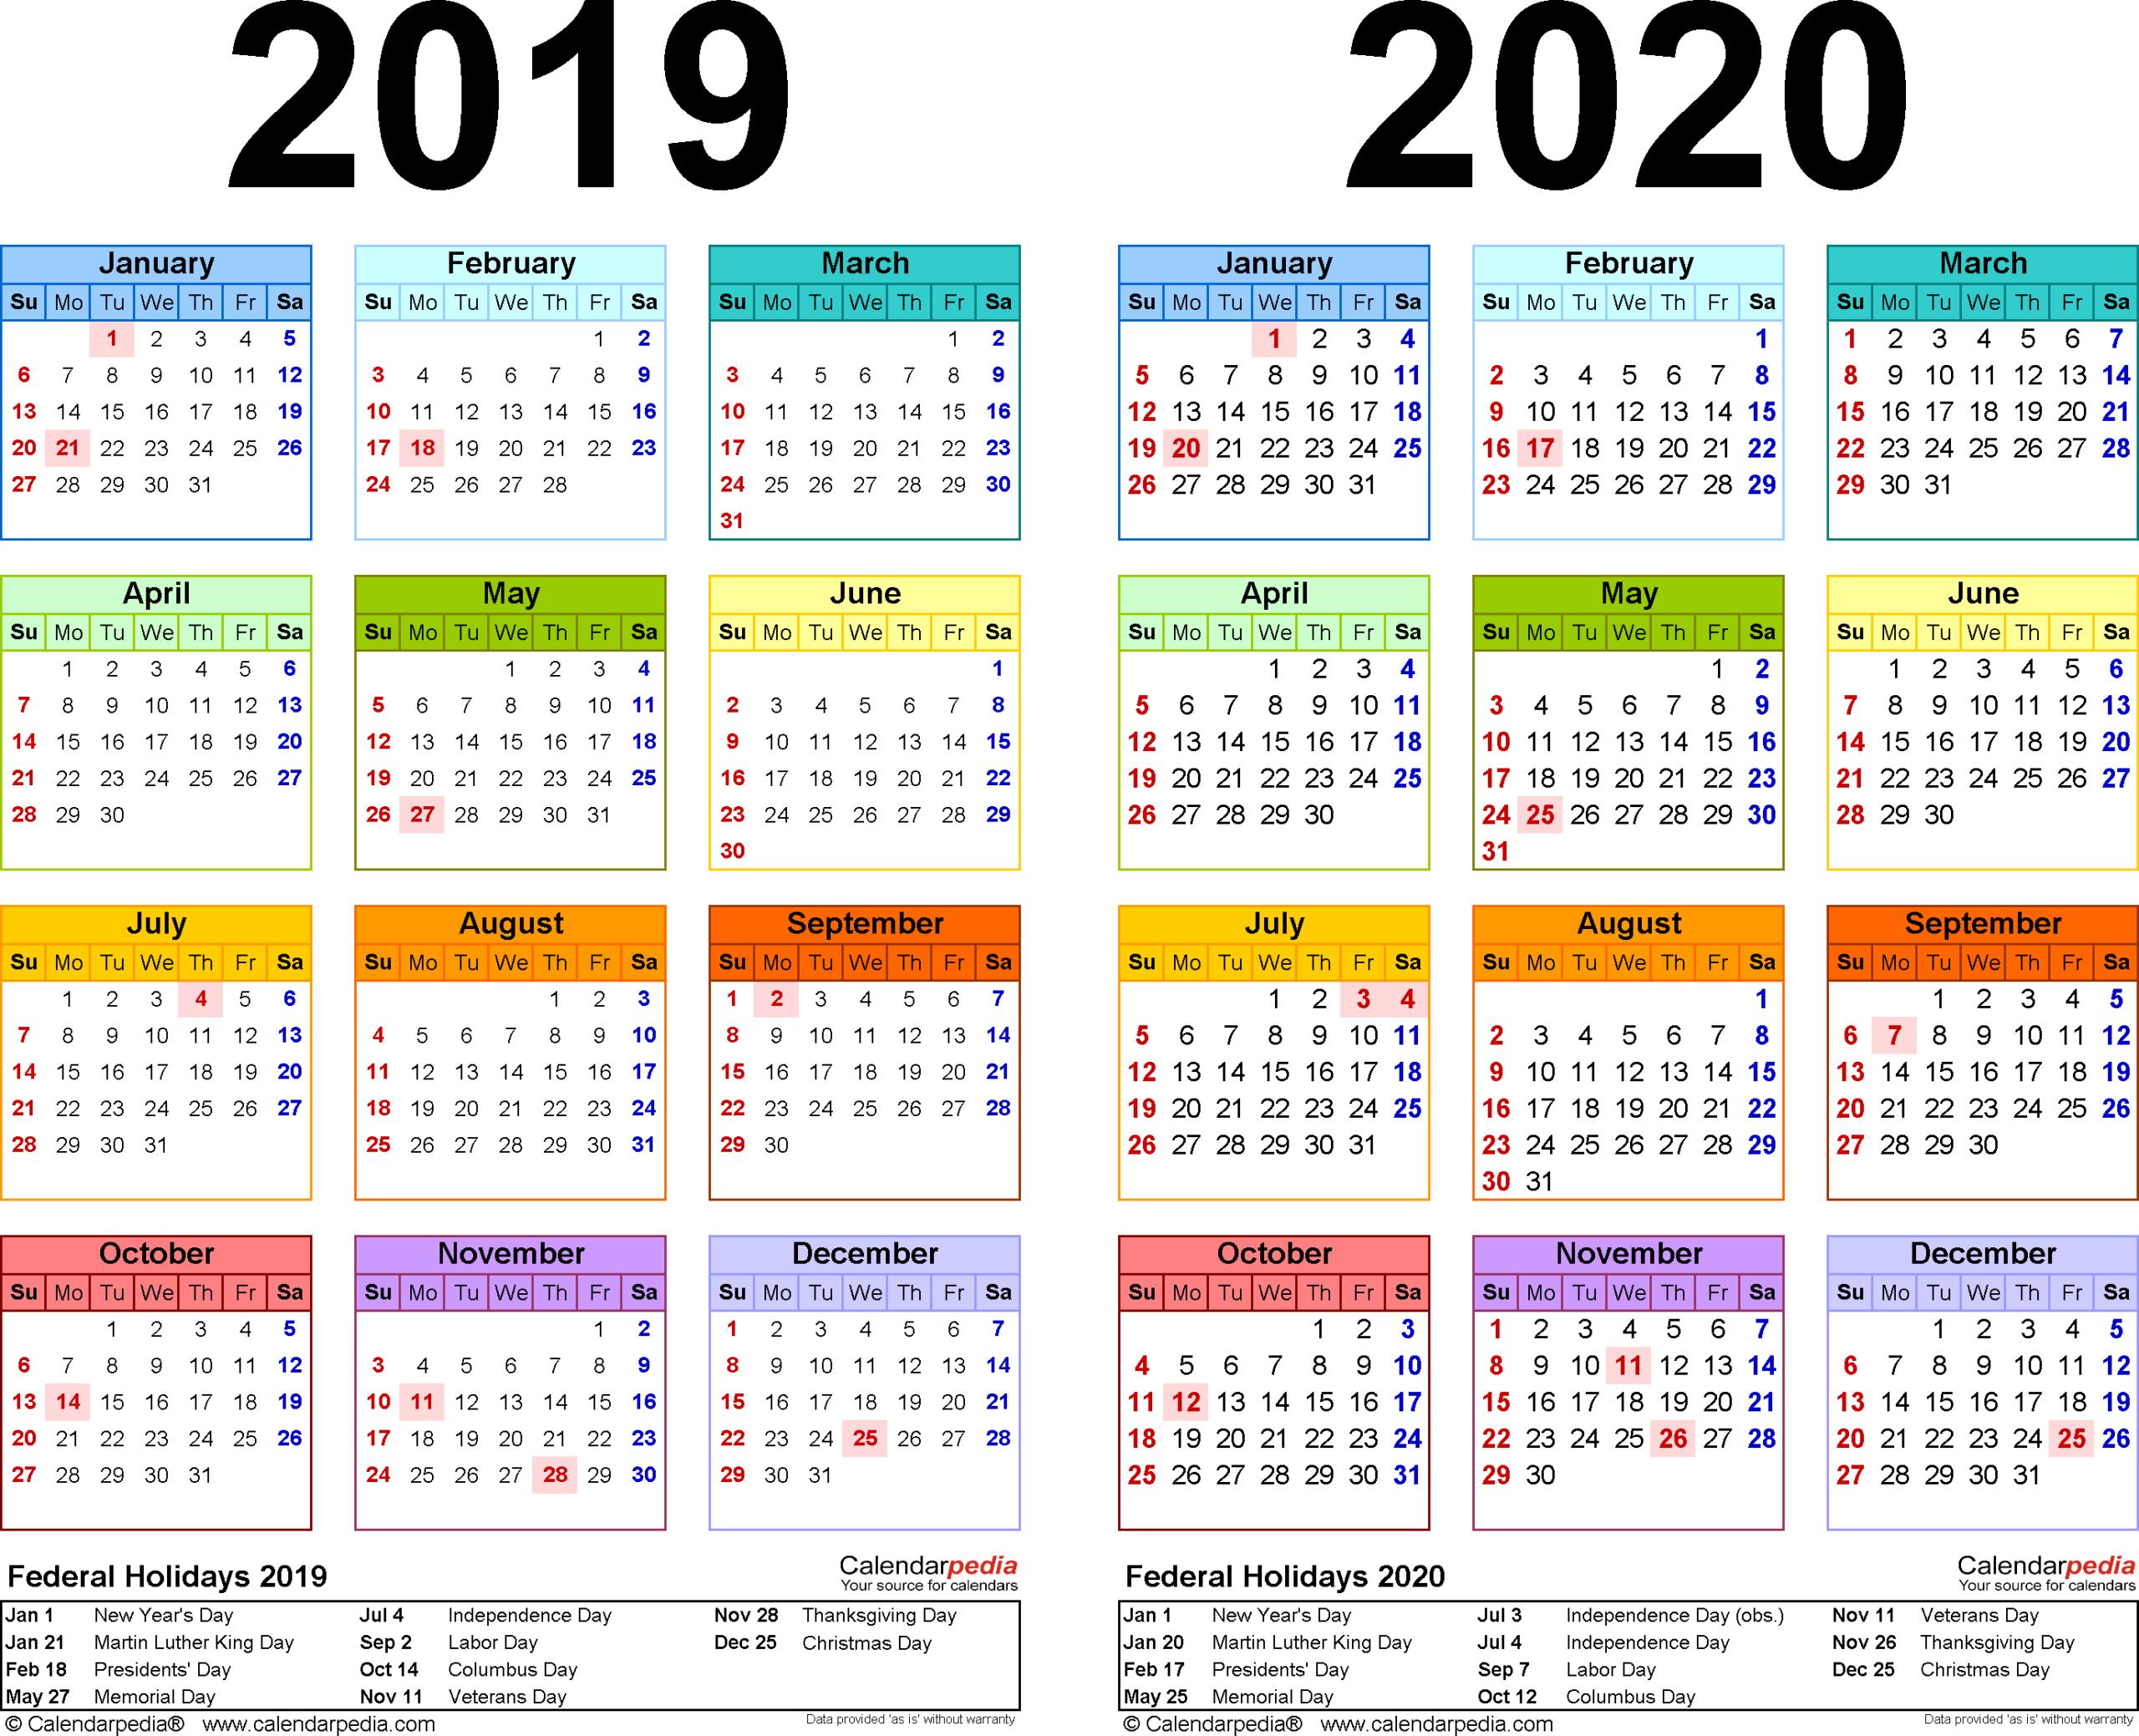 2 Year Pocket Calendar 2020 2021 - Calendar Printable Free for 2021-2021: 2 Year Calendar Pocket